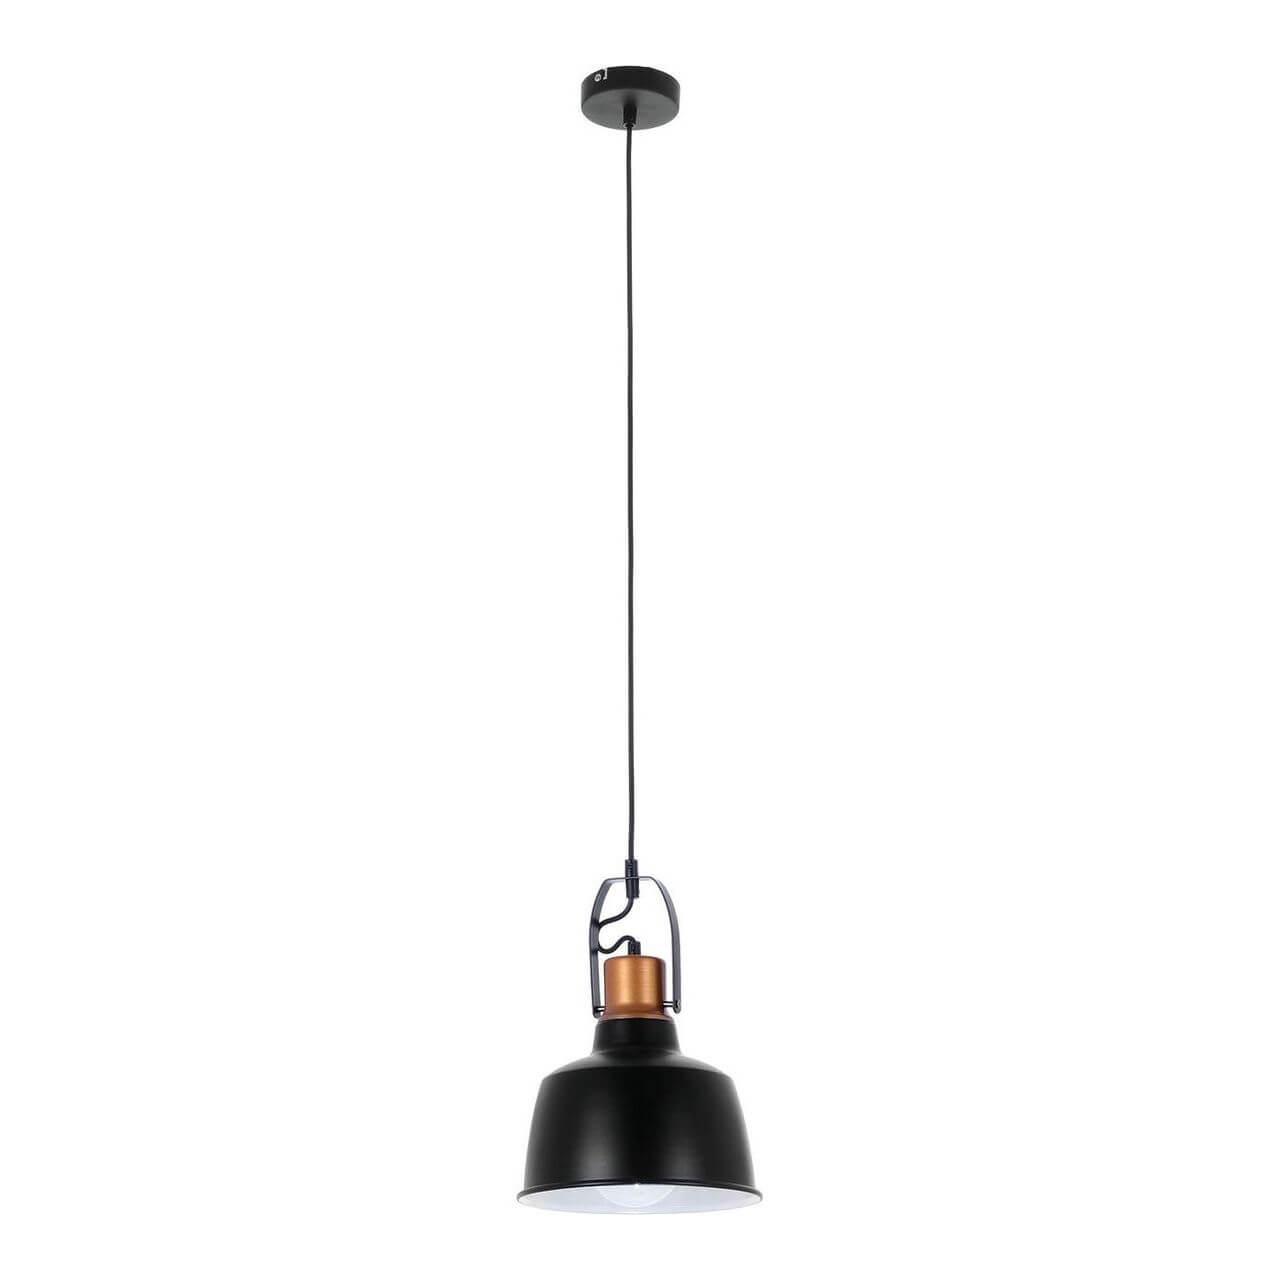 Подвесной светильник Britop Herman 1591104 britop 2742111